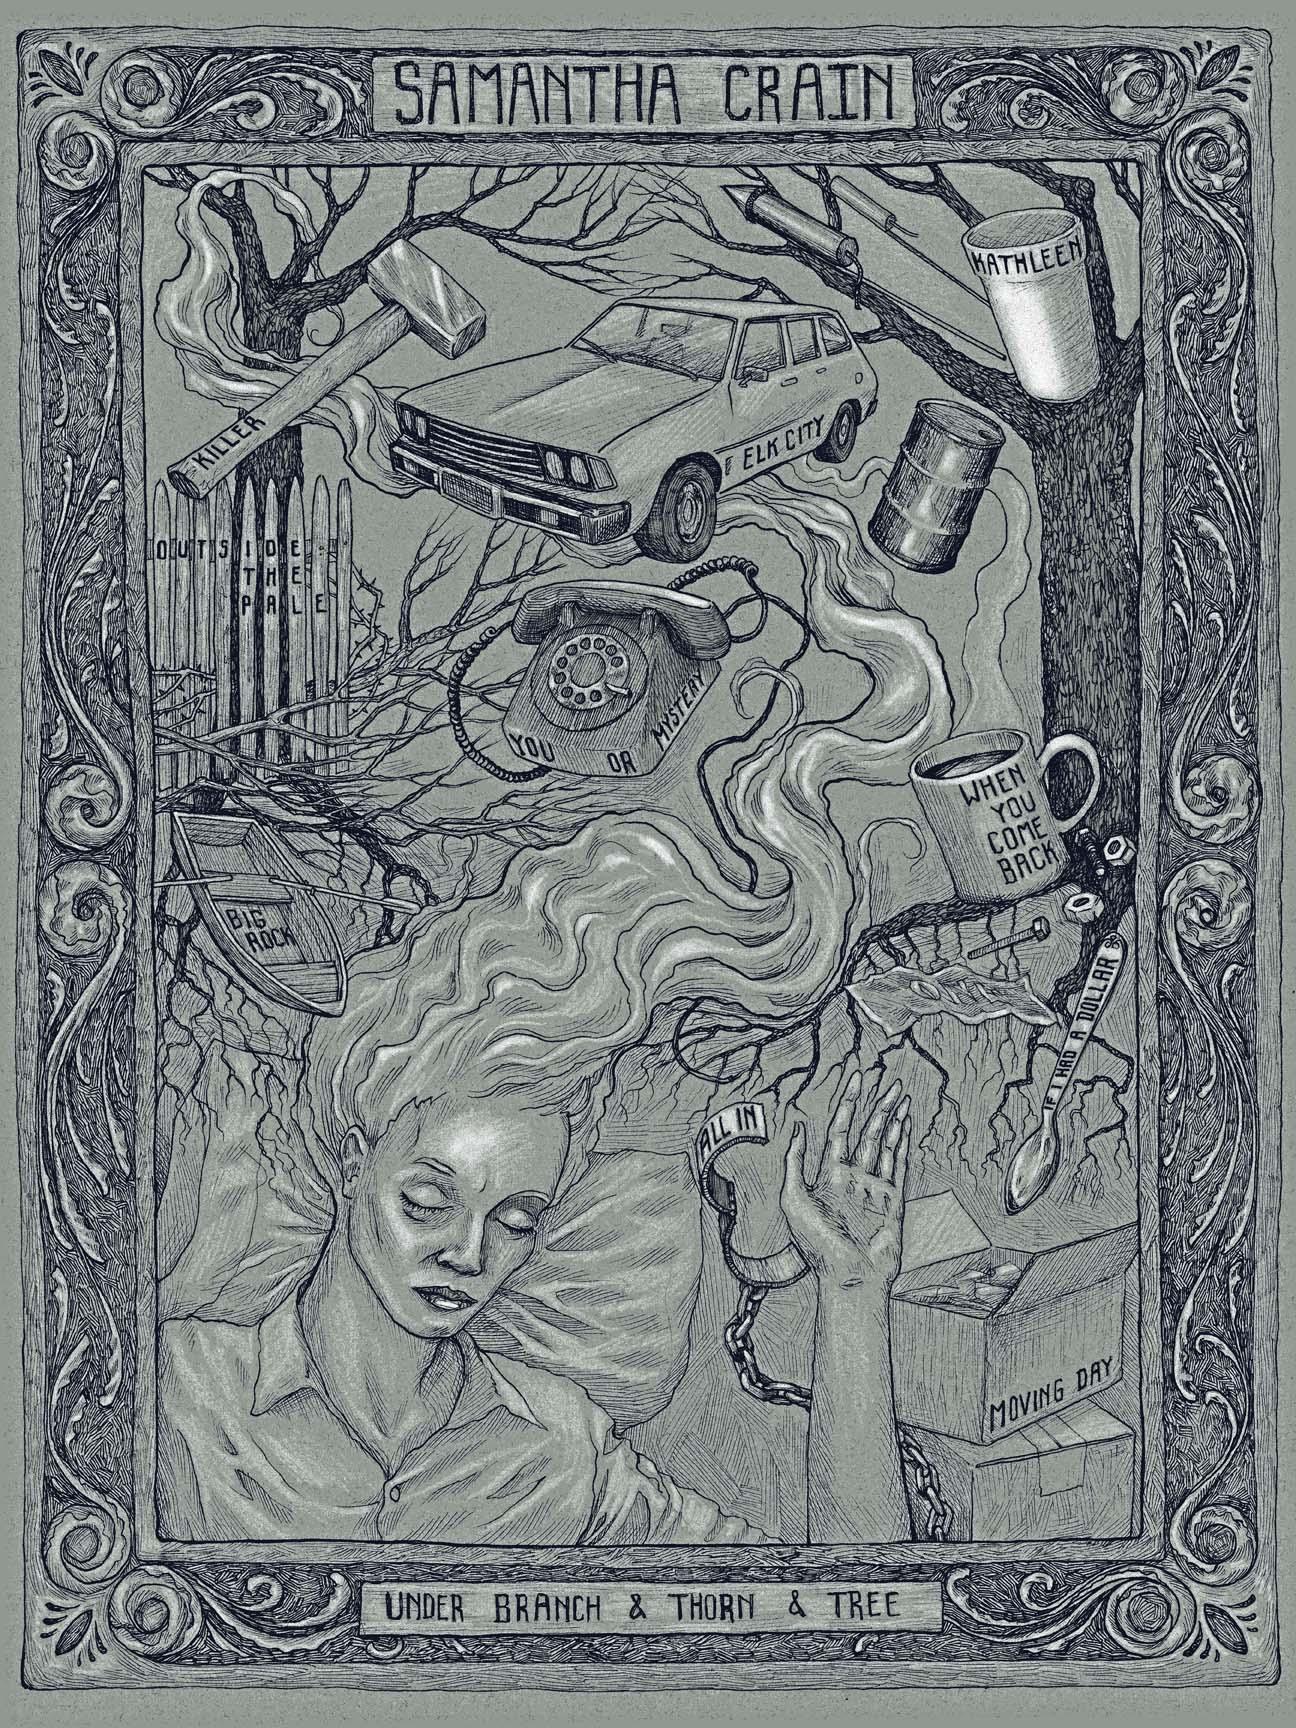 """Samantha Crane - Under Branch & Thorn & Tree"" by Bjorn Bauer.  18"" x 24"" 2-color Screenprint.  AP edition S.  $20"